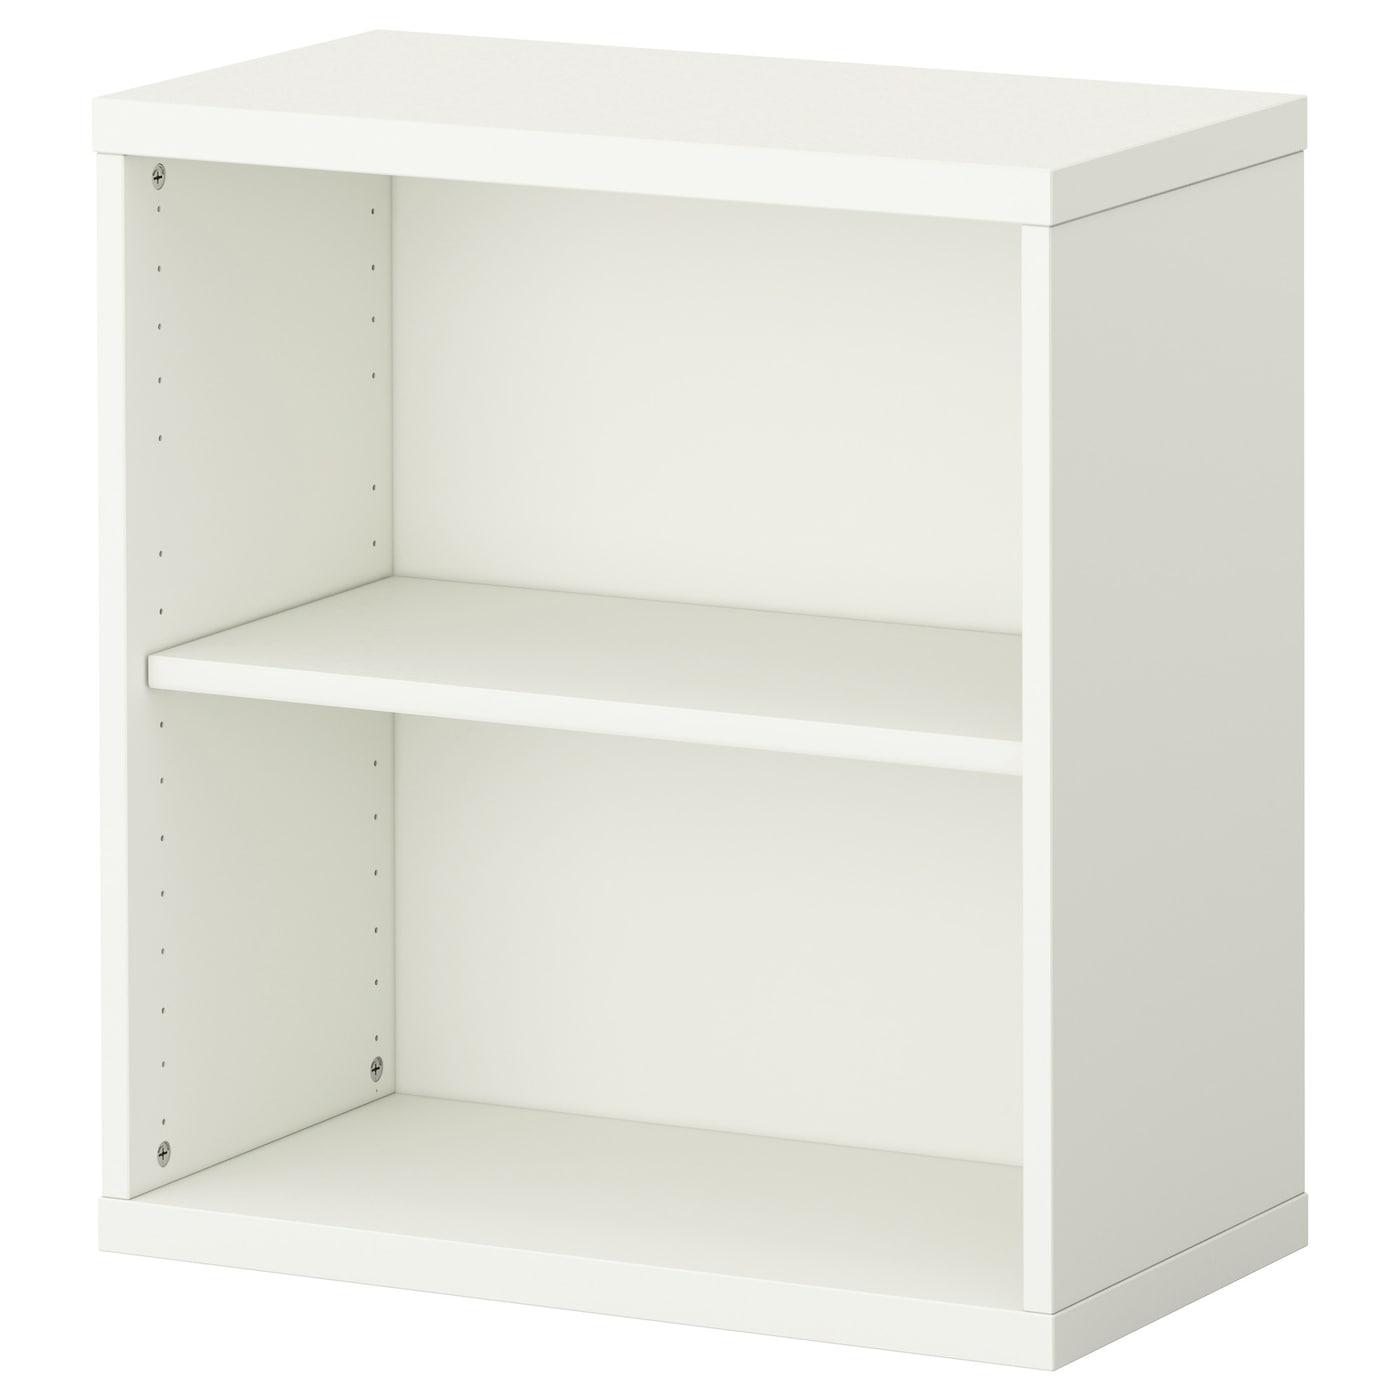 stuva tag re murale blanc 60x30x64 cm ikea. Black Bedroom Furniture Sets. Home Design Ideas